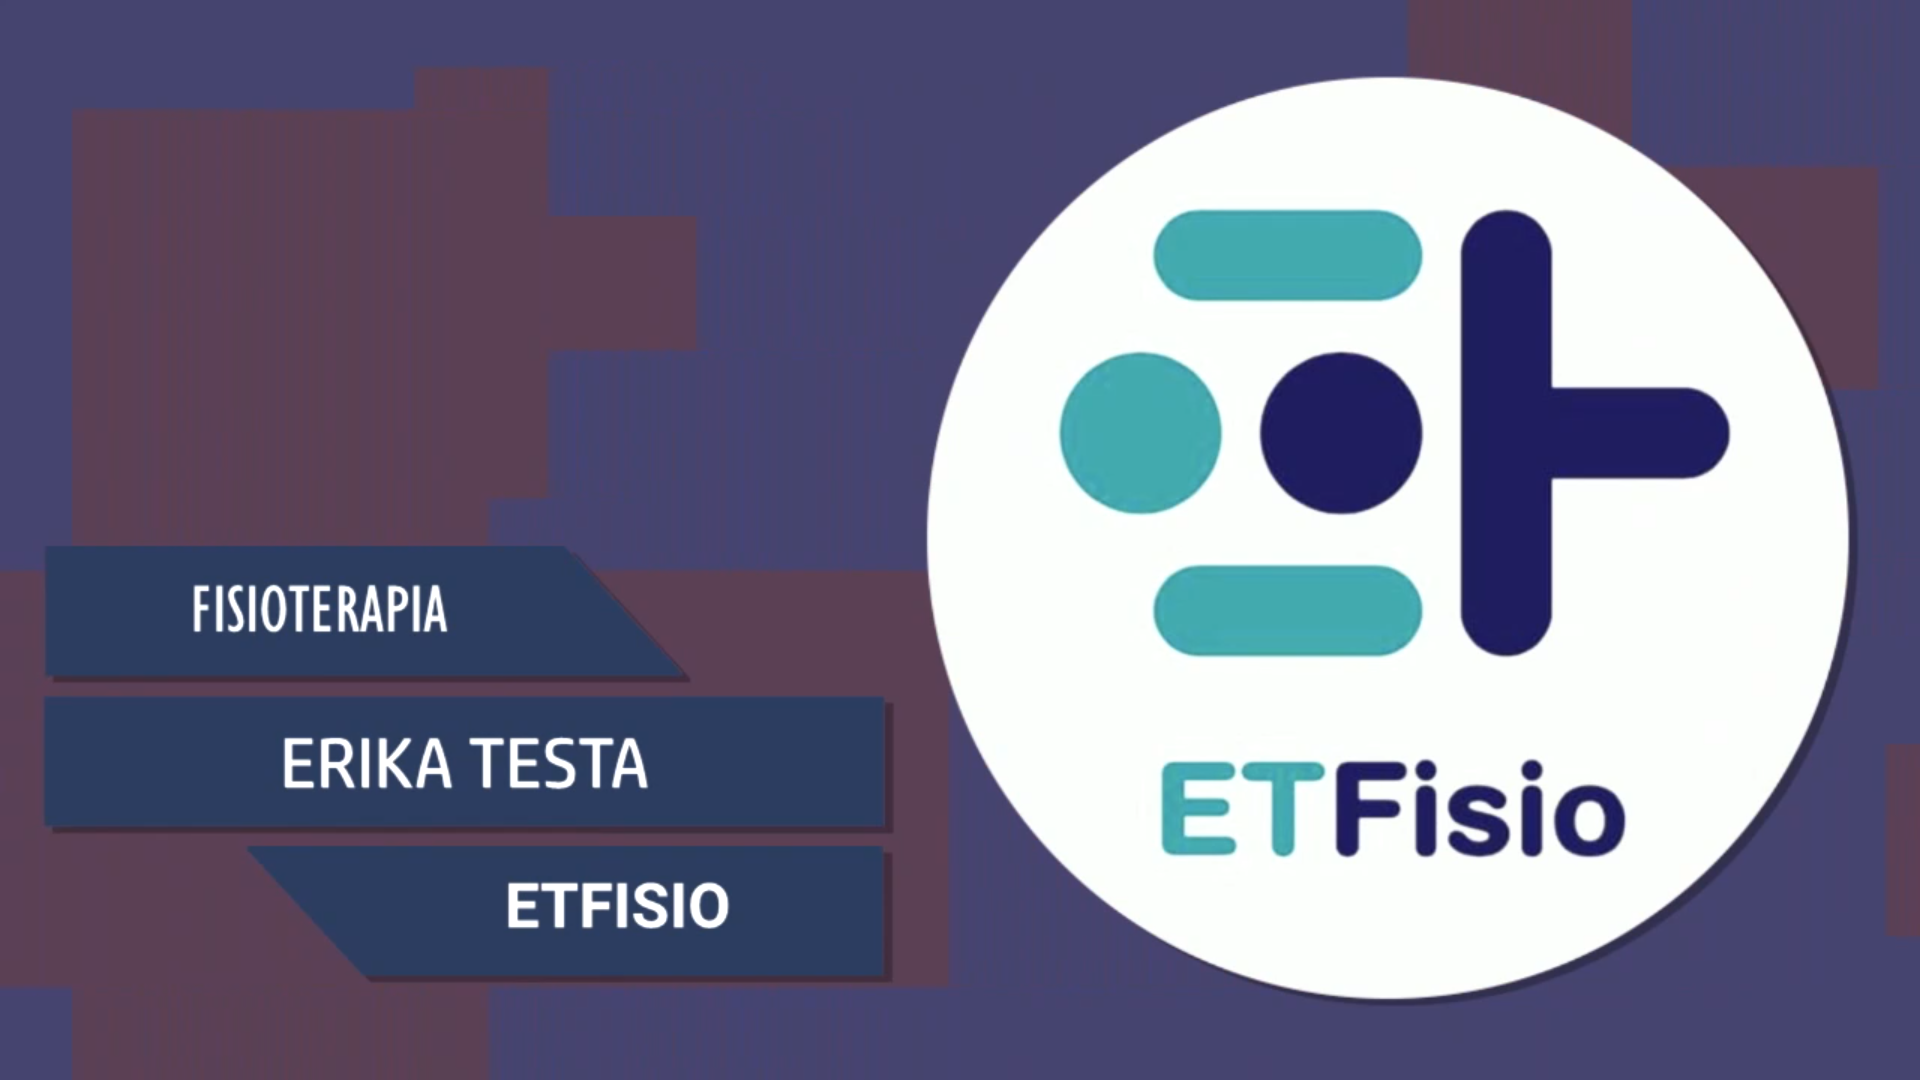 Intervista a Erika Testa – Etfisio